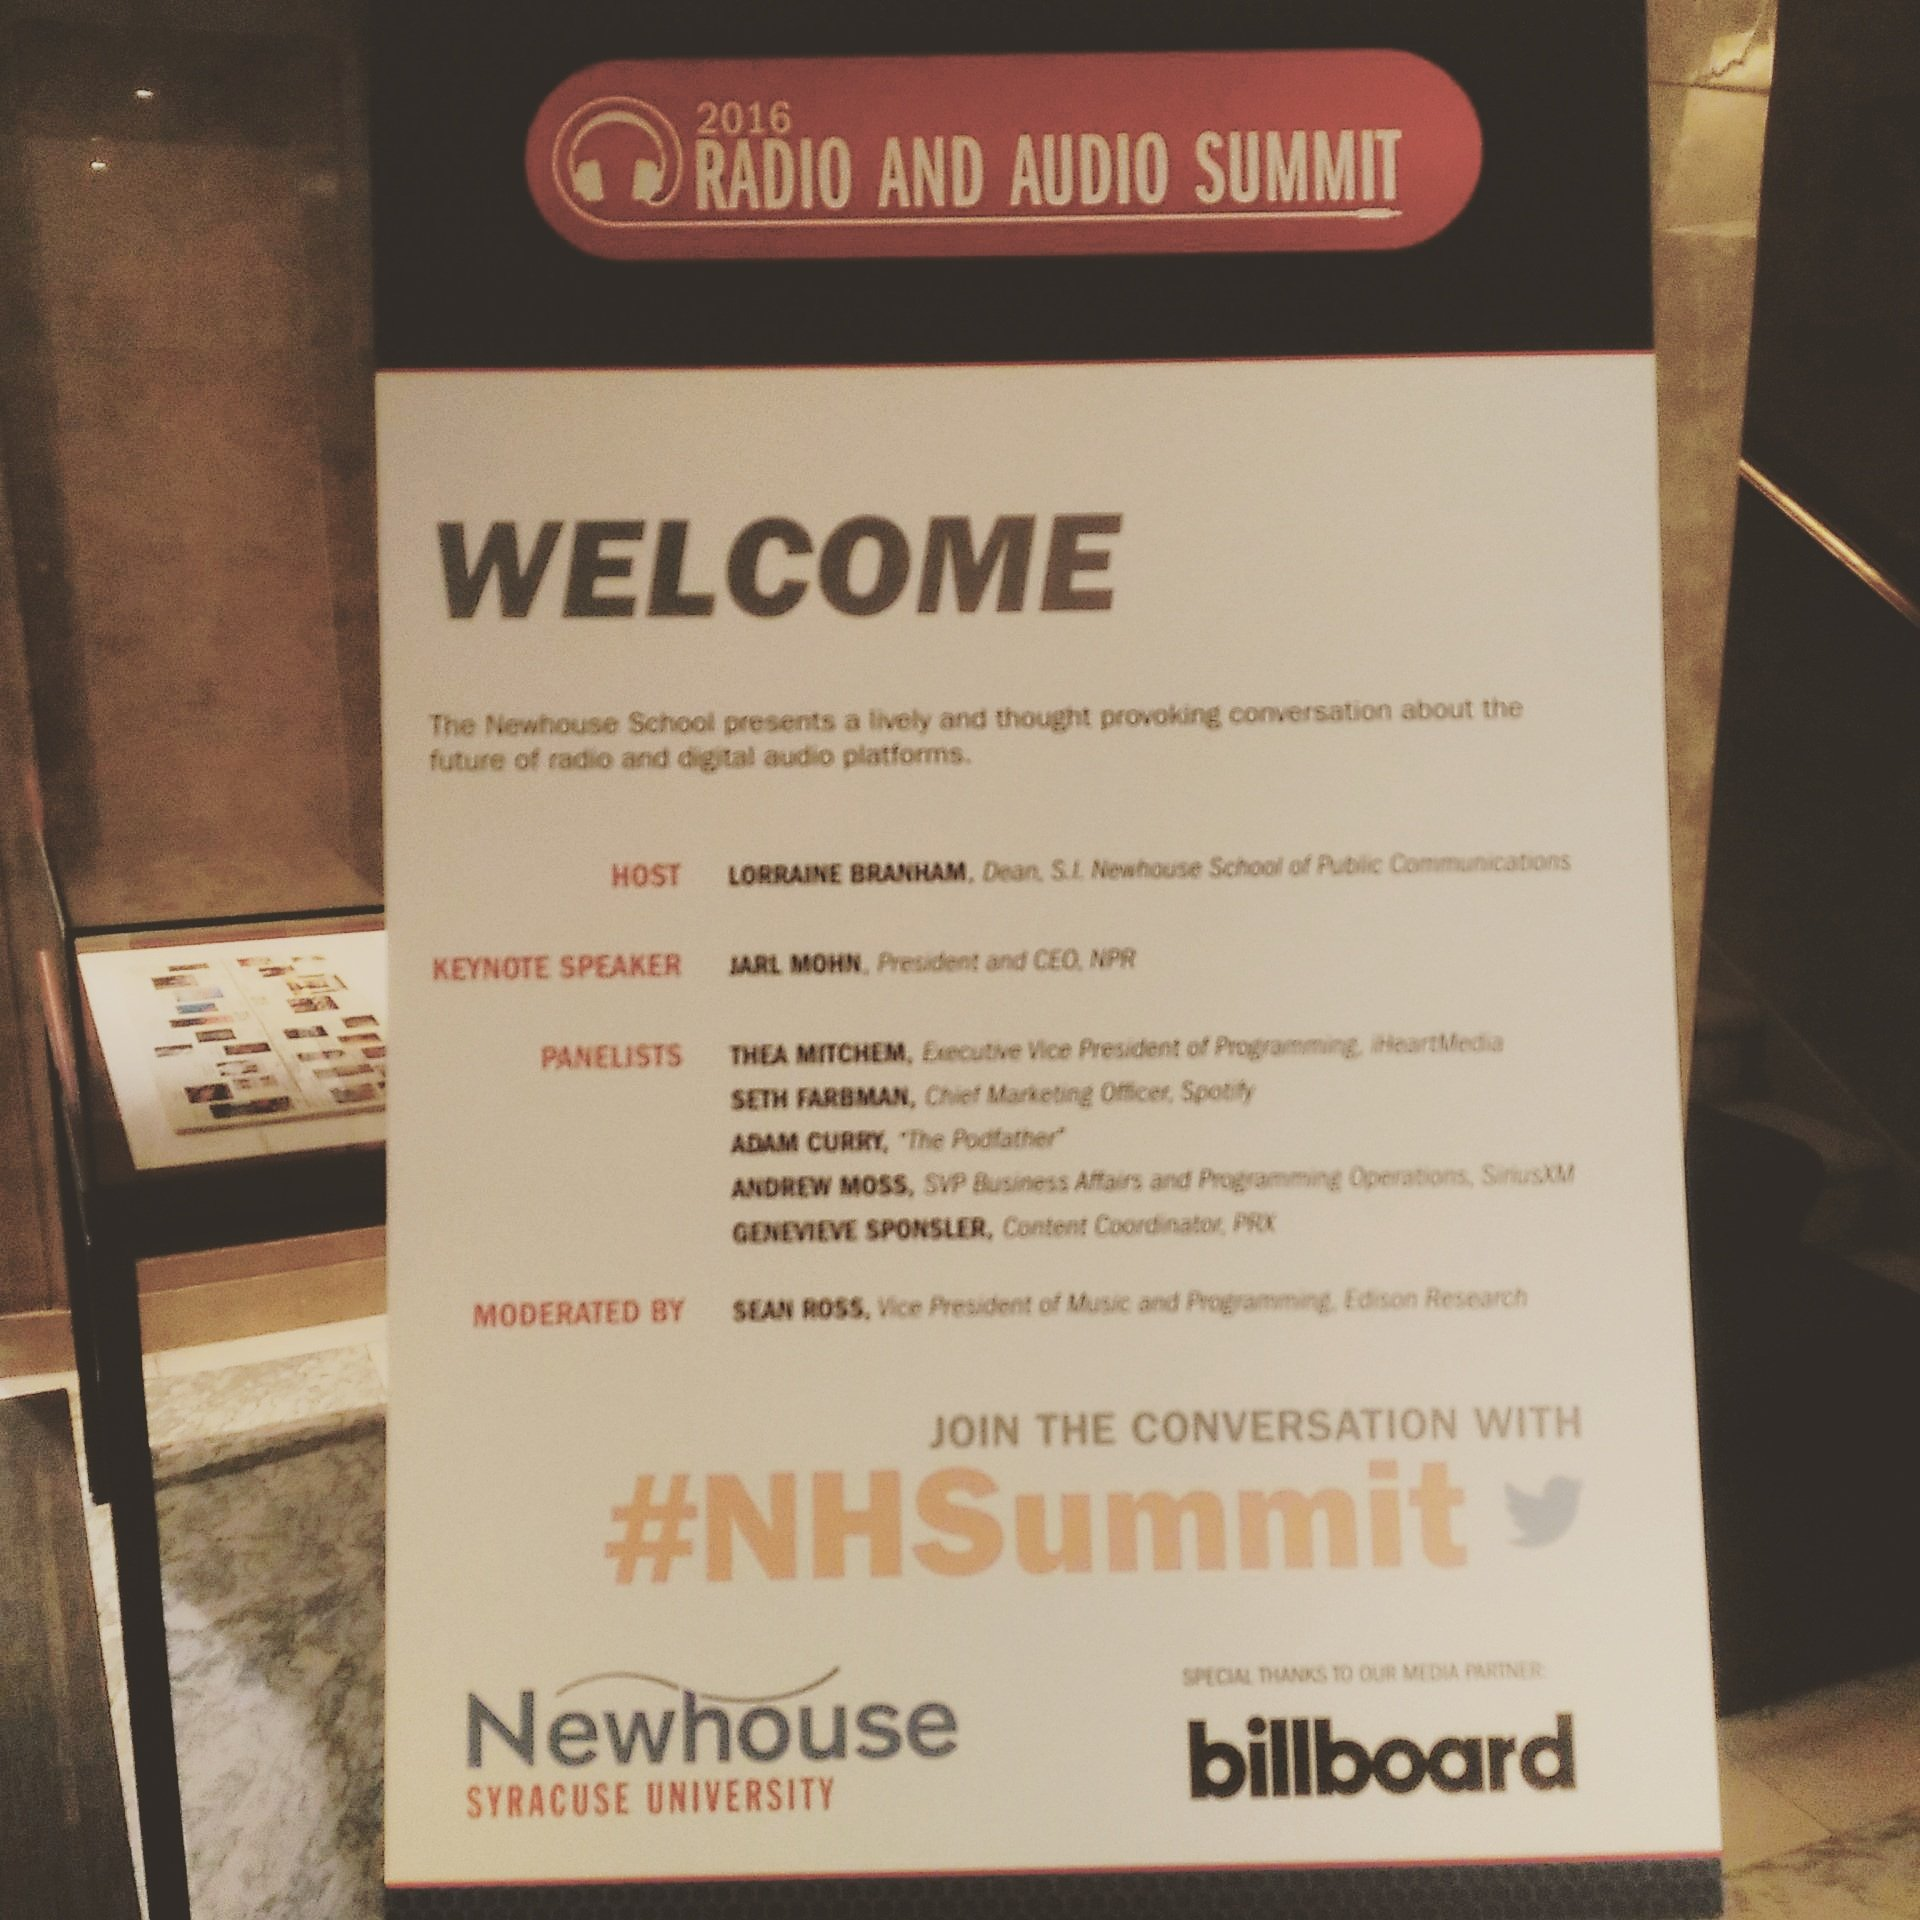 Live tweeting the 2016 Radio & Audio Summit! Representing @bondfireradio #NHSummit https://t.co/nvyqOBlNj1